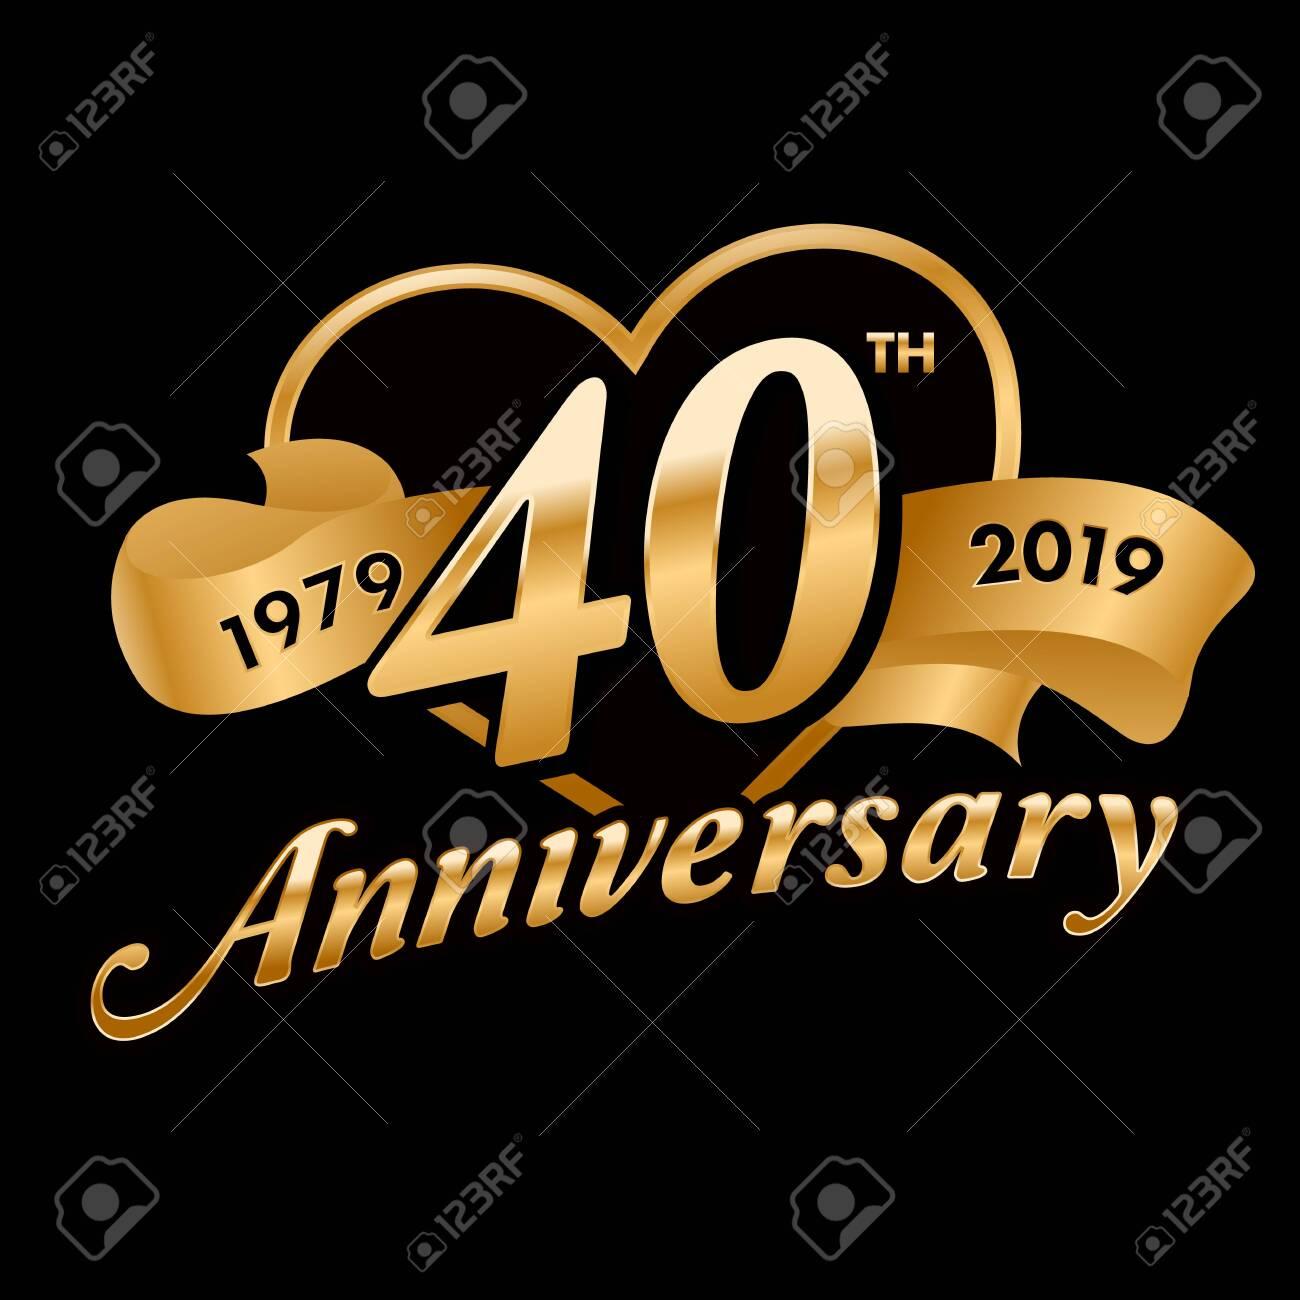 40th Anniversary - 121759299